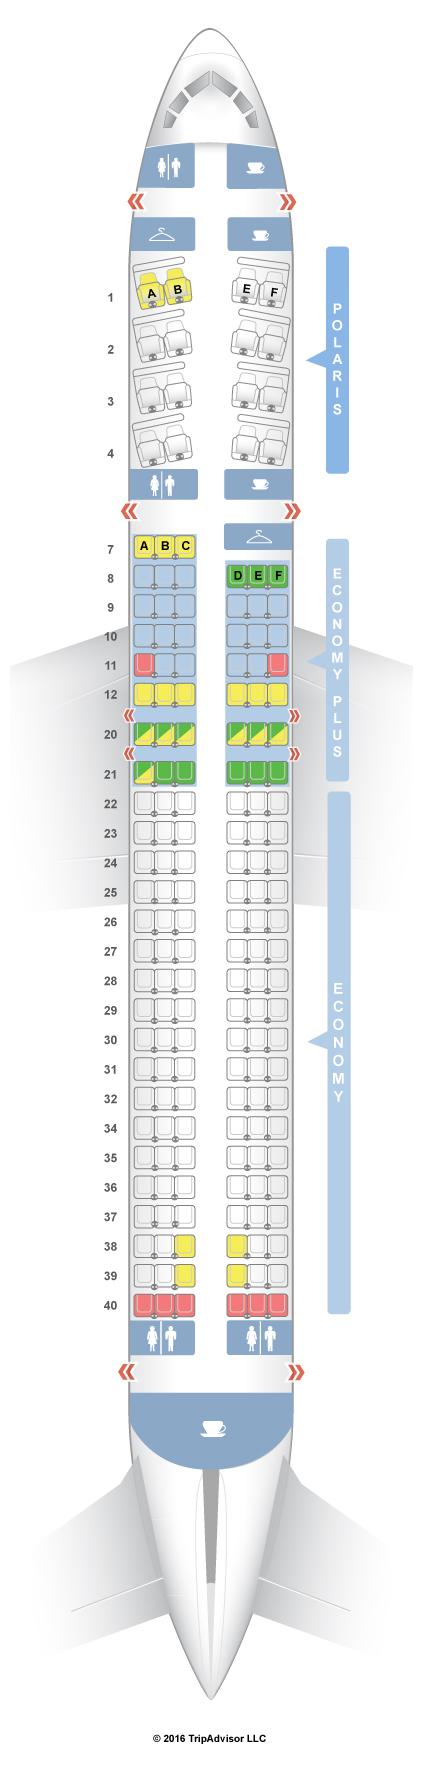 Seatguru seat map united boeing 757 200 752 v1 intl